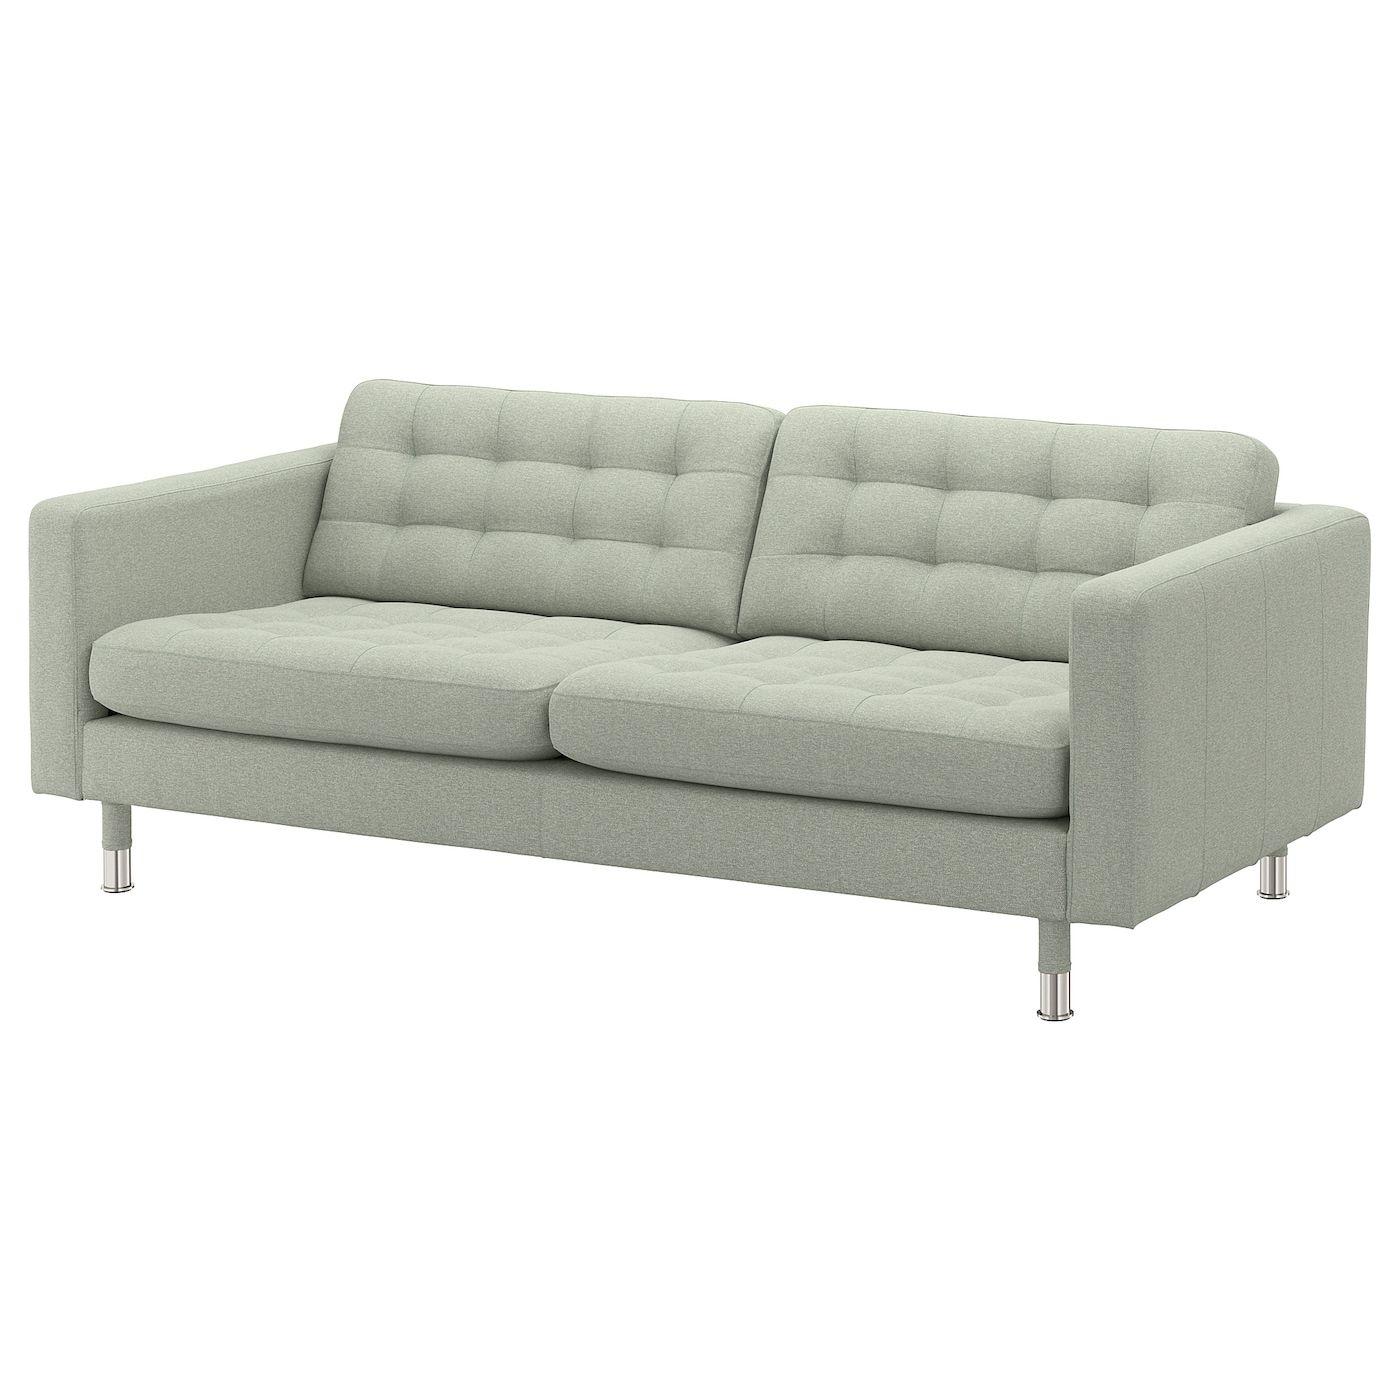 Landskrona 3er Sofa Gunnared Hellgrun Heute Noch Kaufen Ikea Osterreich In 2020 3er Sofa Sofa Stoff Couch Mobel